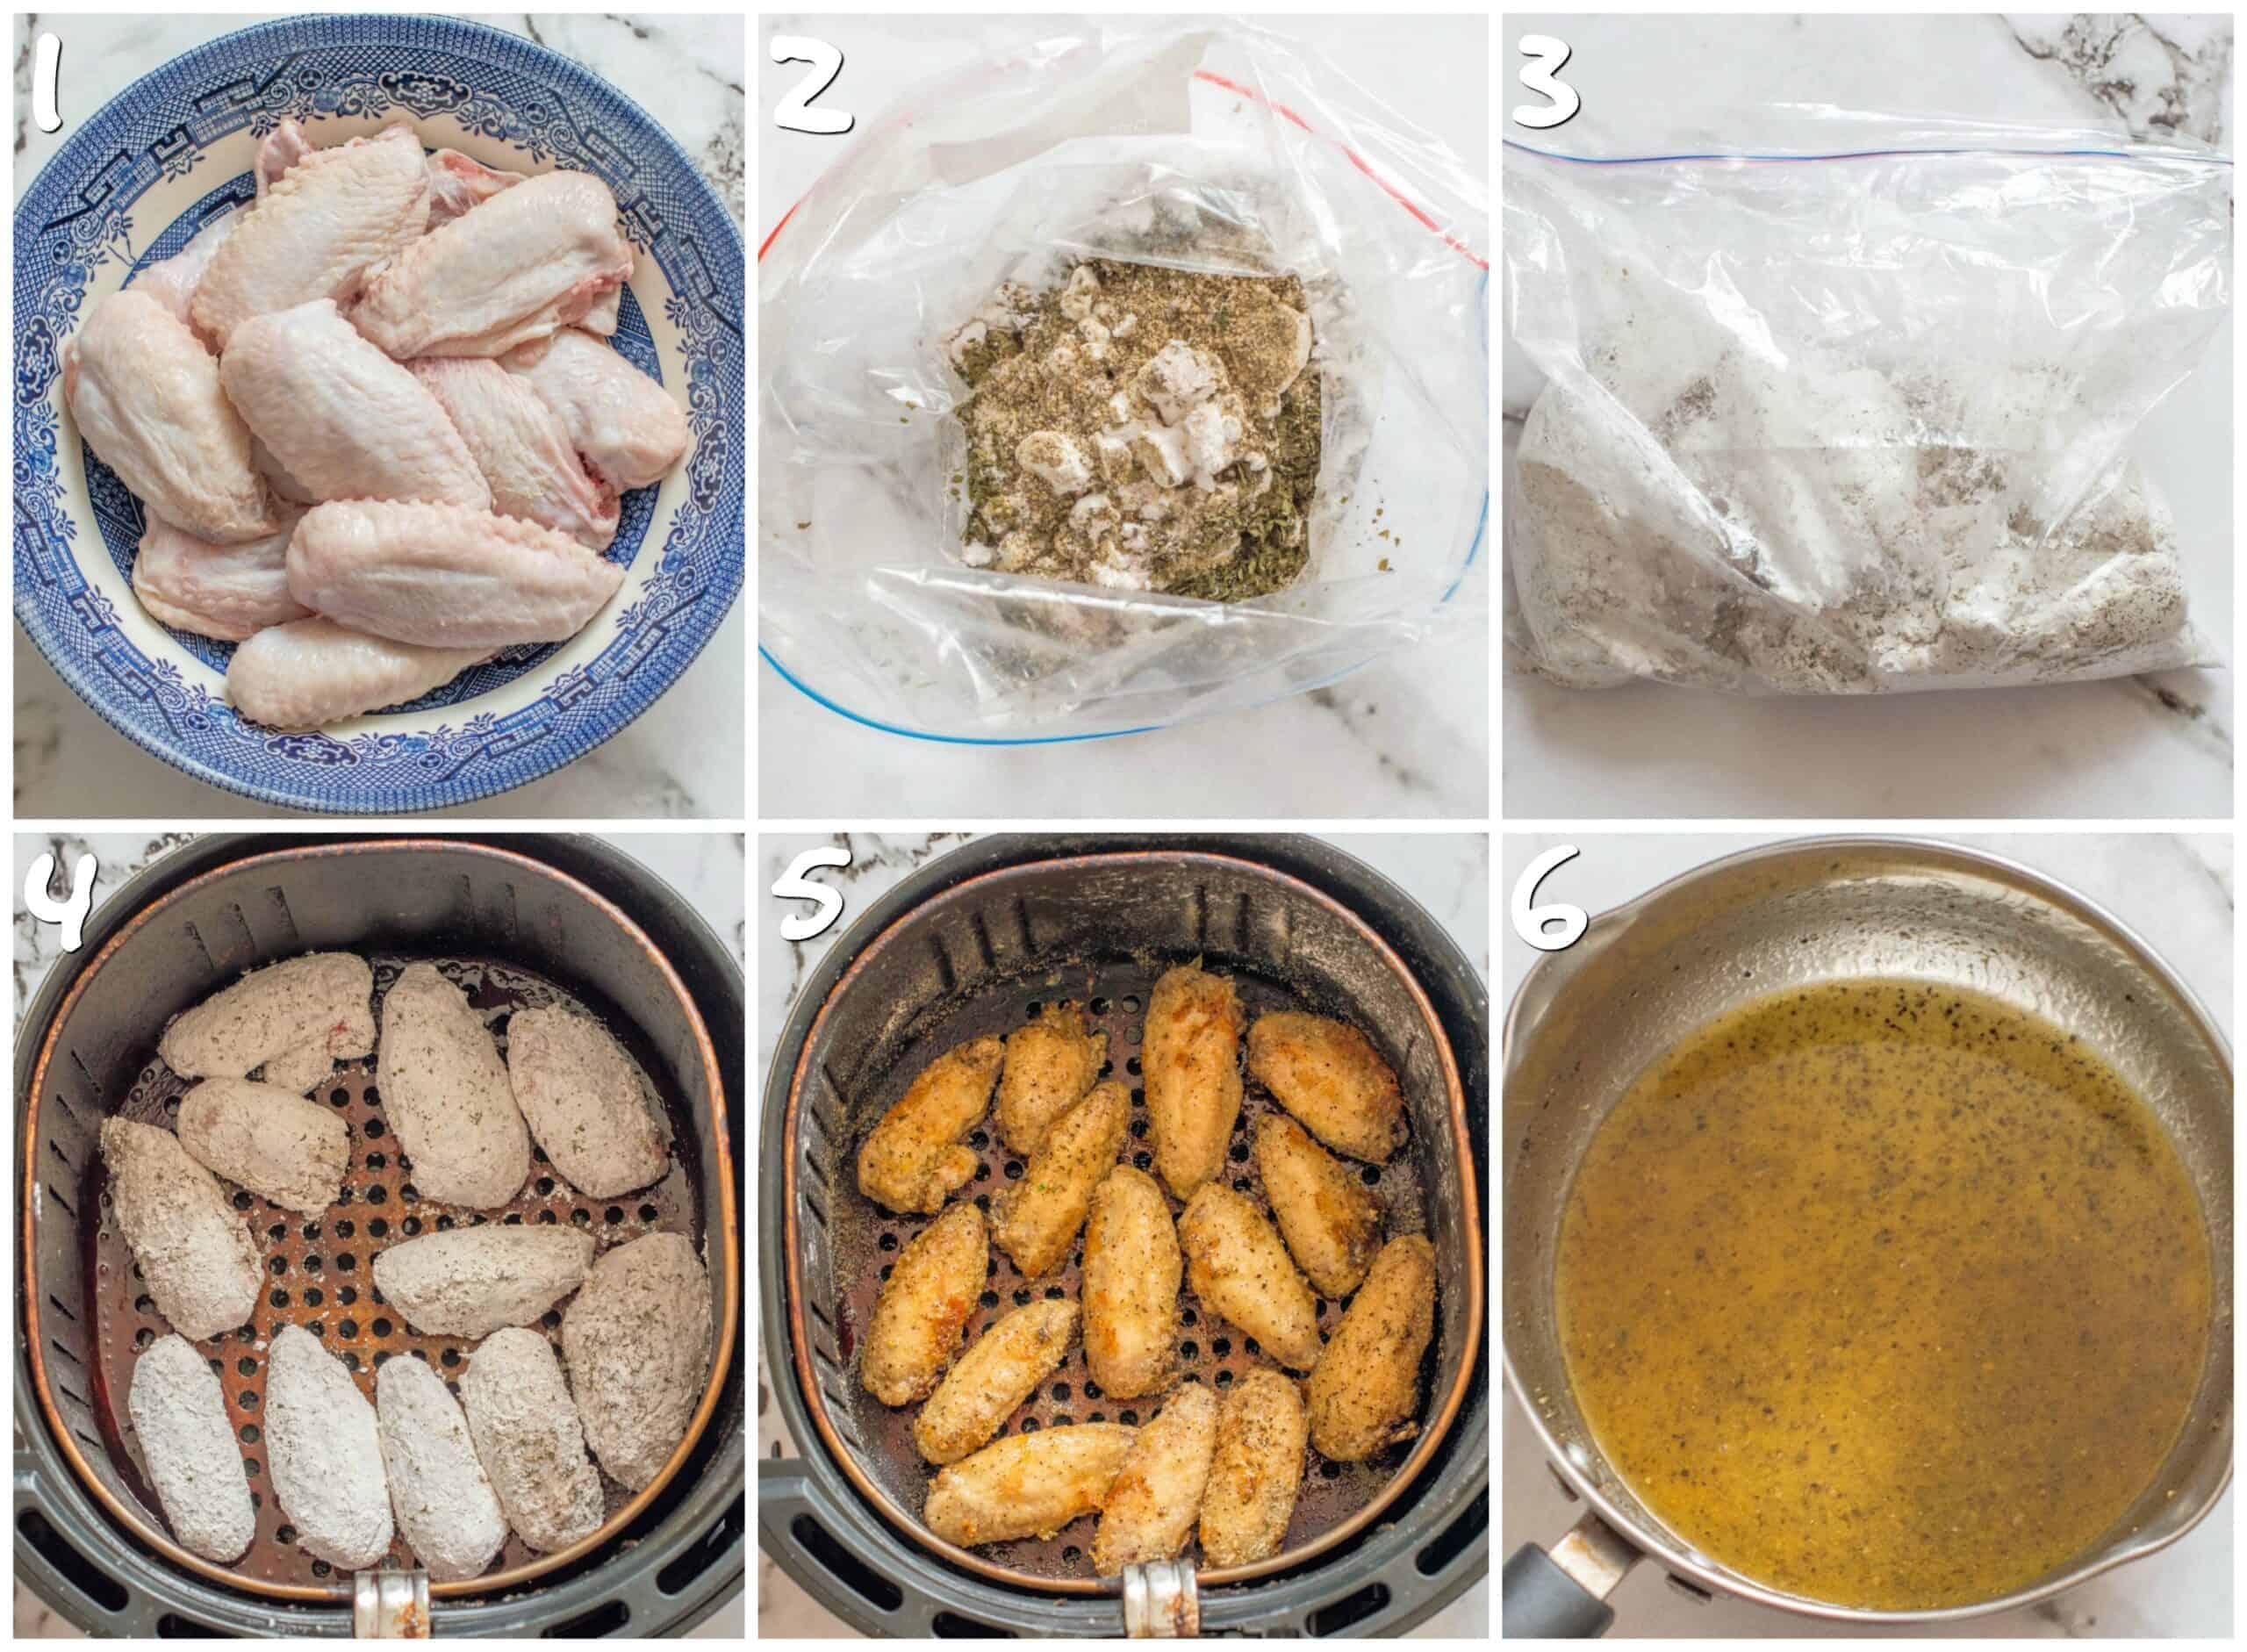 steps 1-6 prepping the chicken